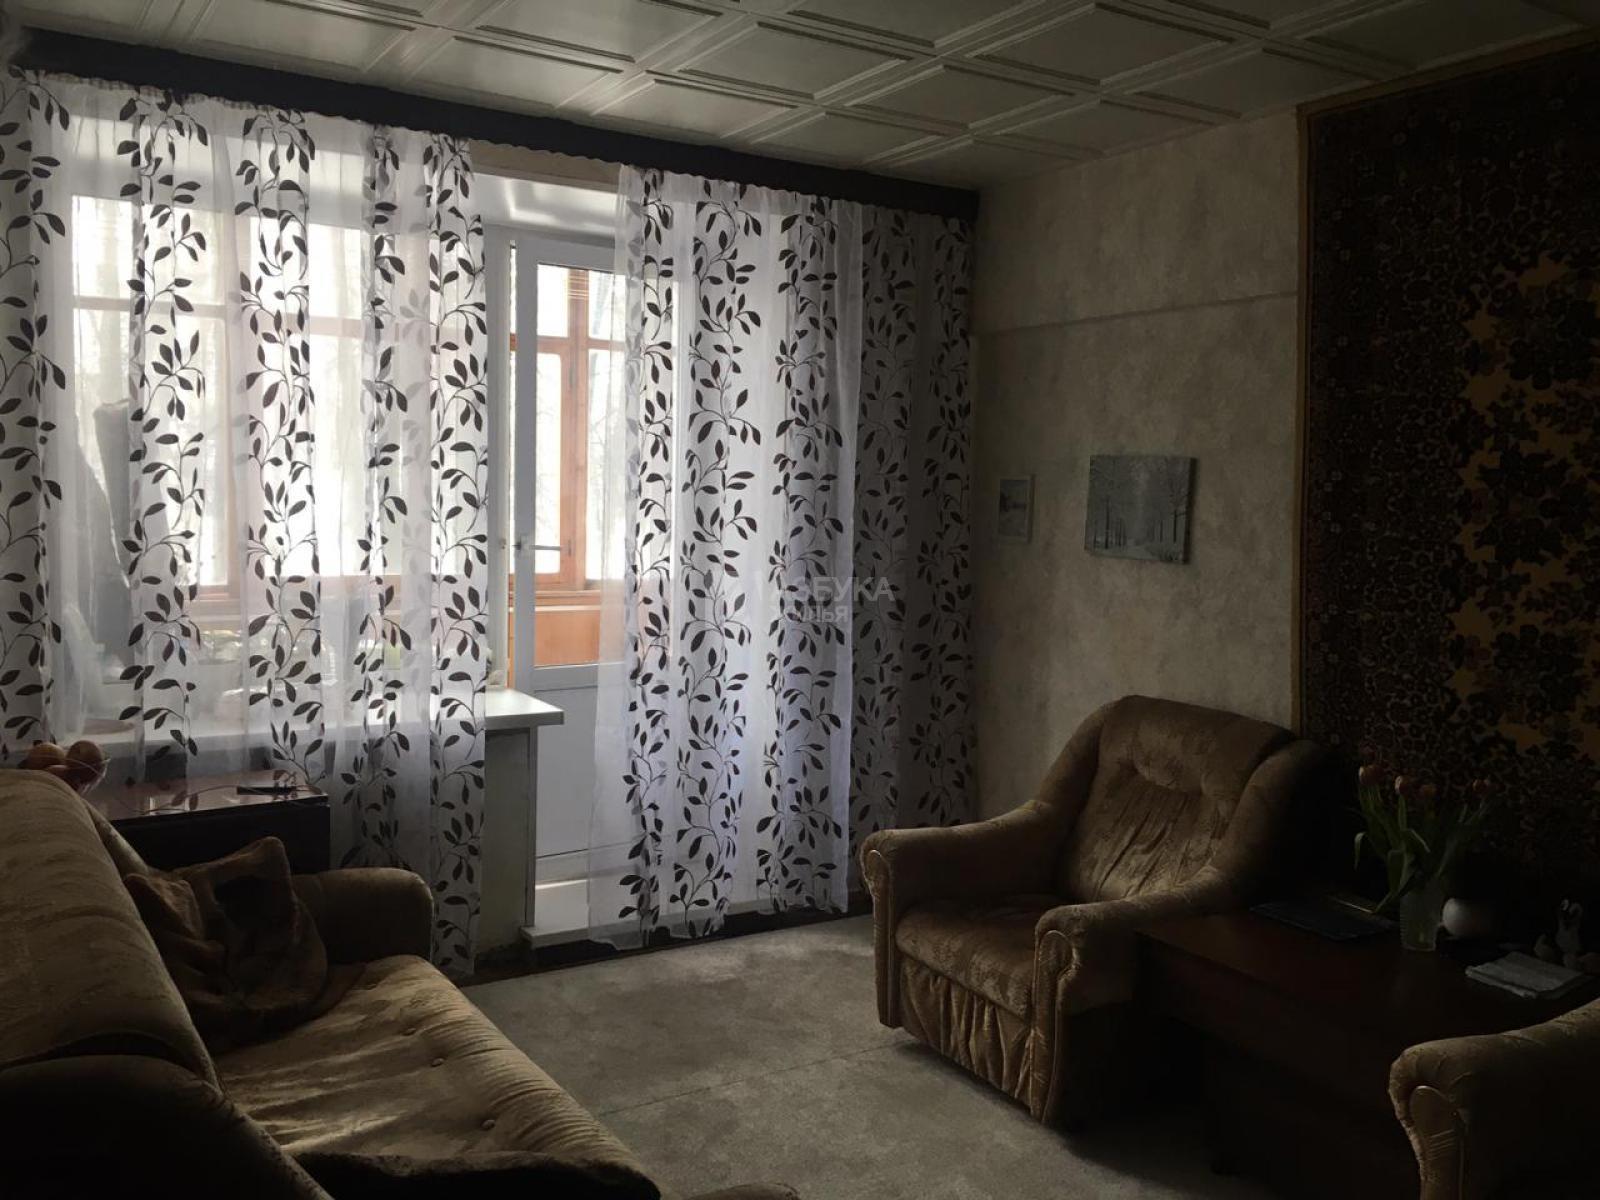 Фото №13 - 3-комнатная квартира, Москва, Солнечногорский проезд 5 корпус 1, метро Беломорская